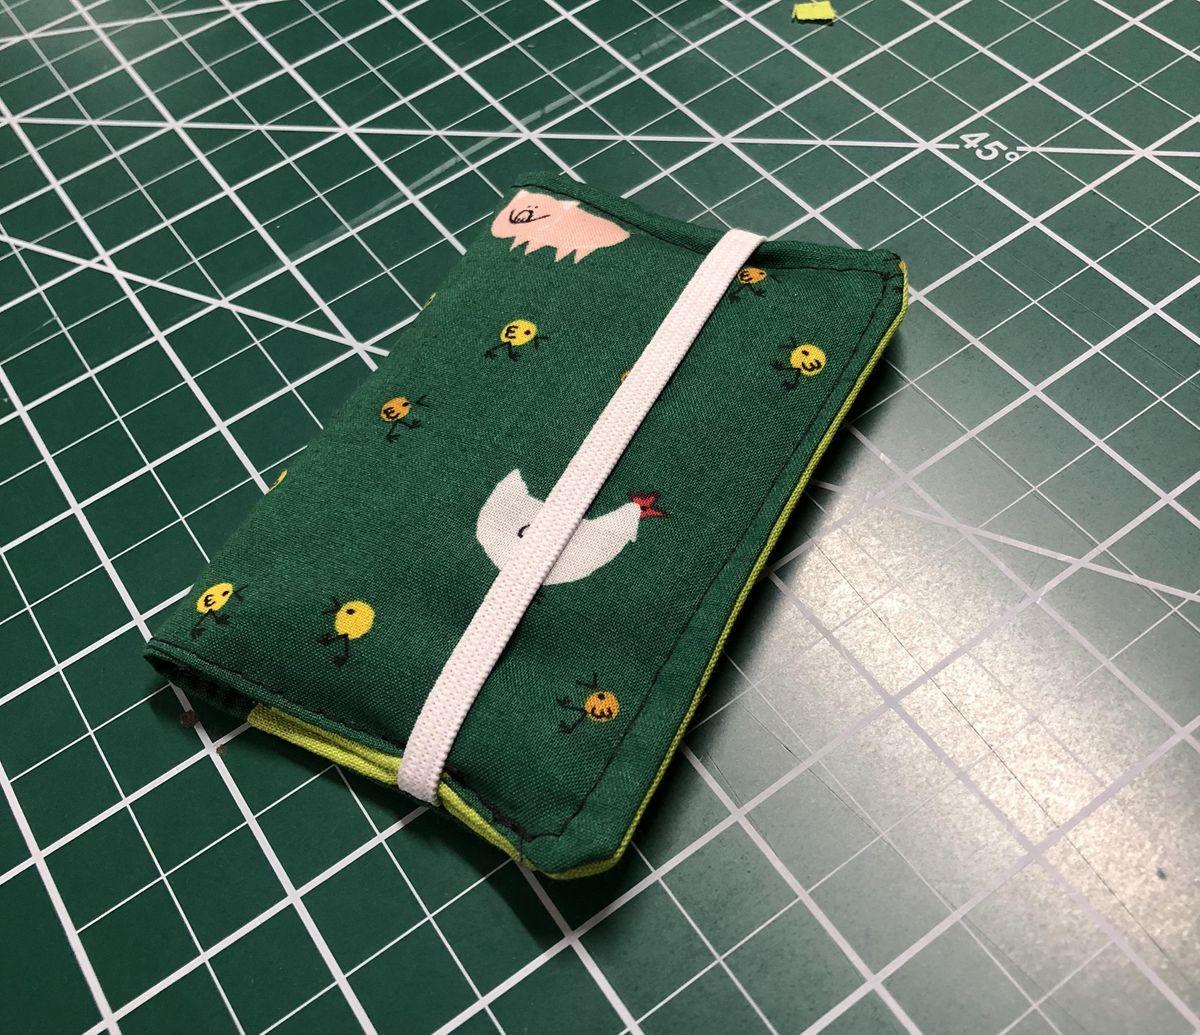 Tool Training Sewing Machine 101